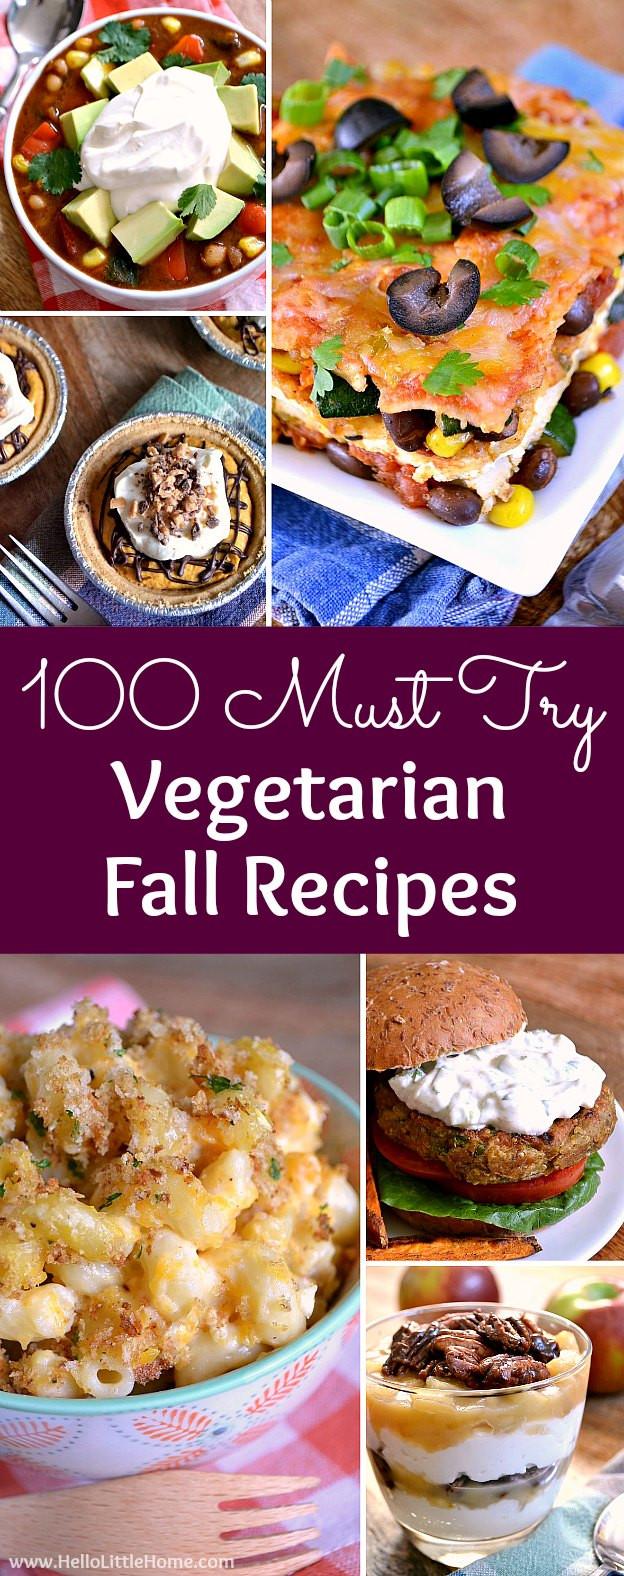 Vegetarian Fall Dinner Recipes  100 Must Try Ve arian Fall Recipes